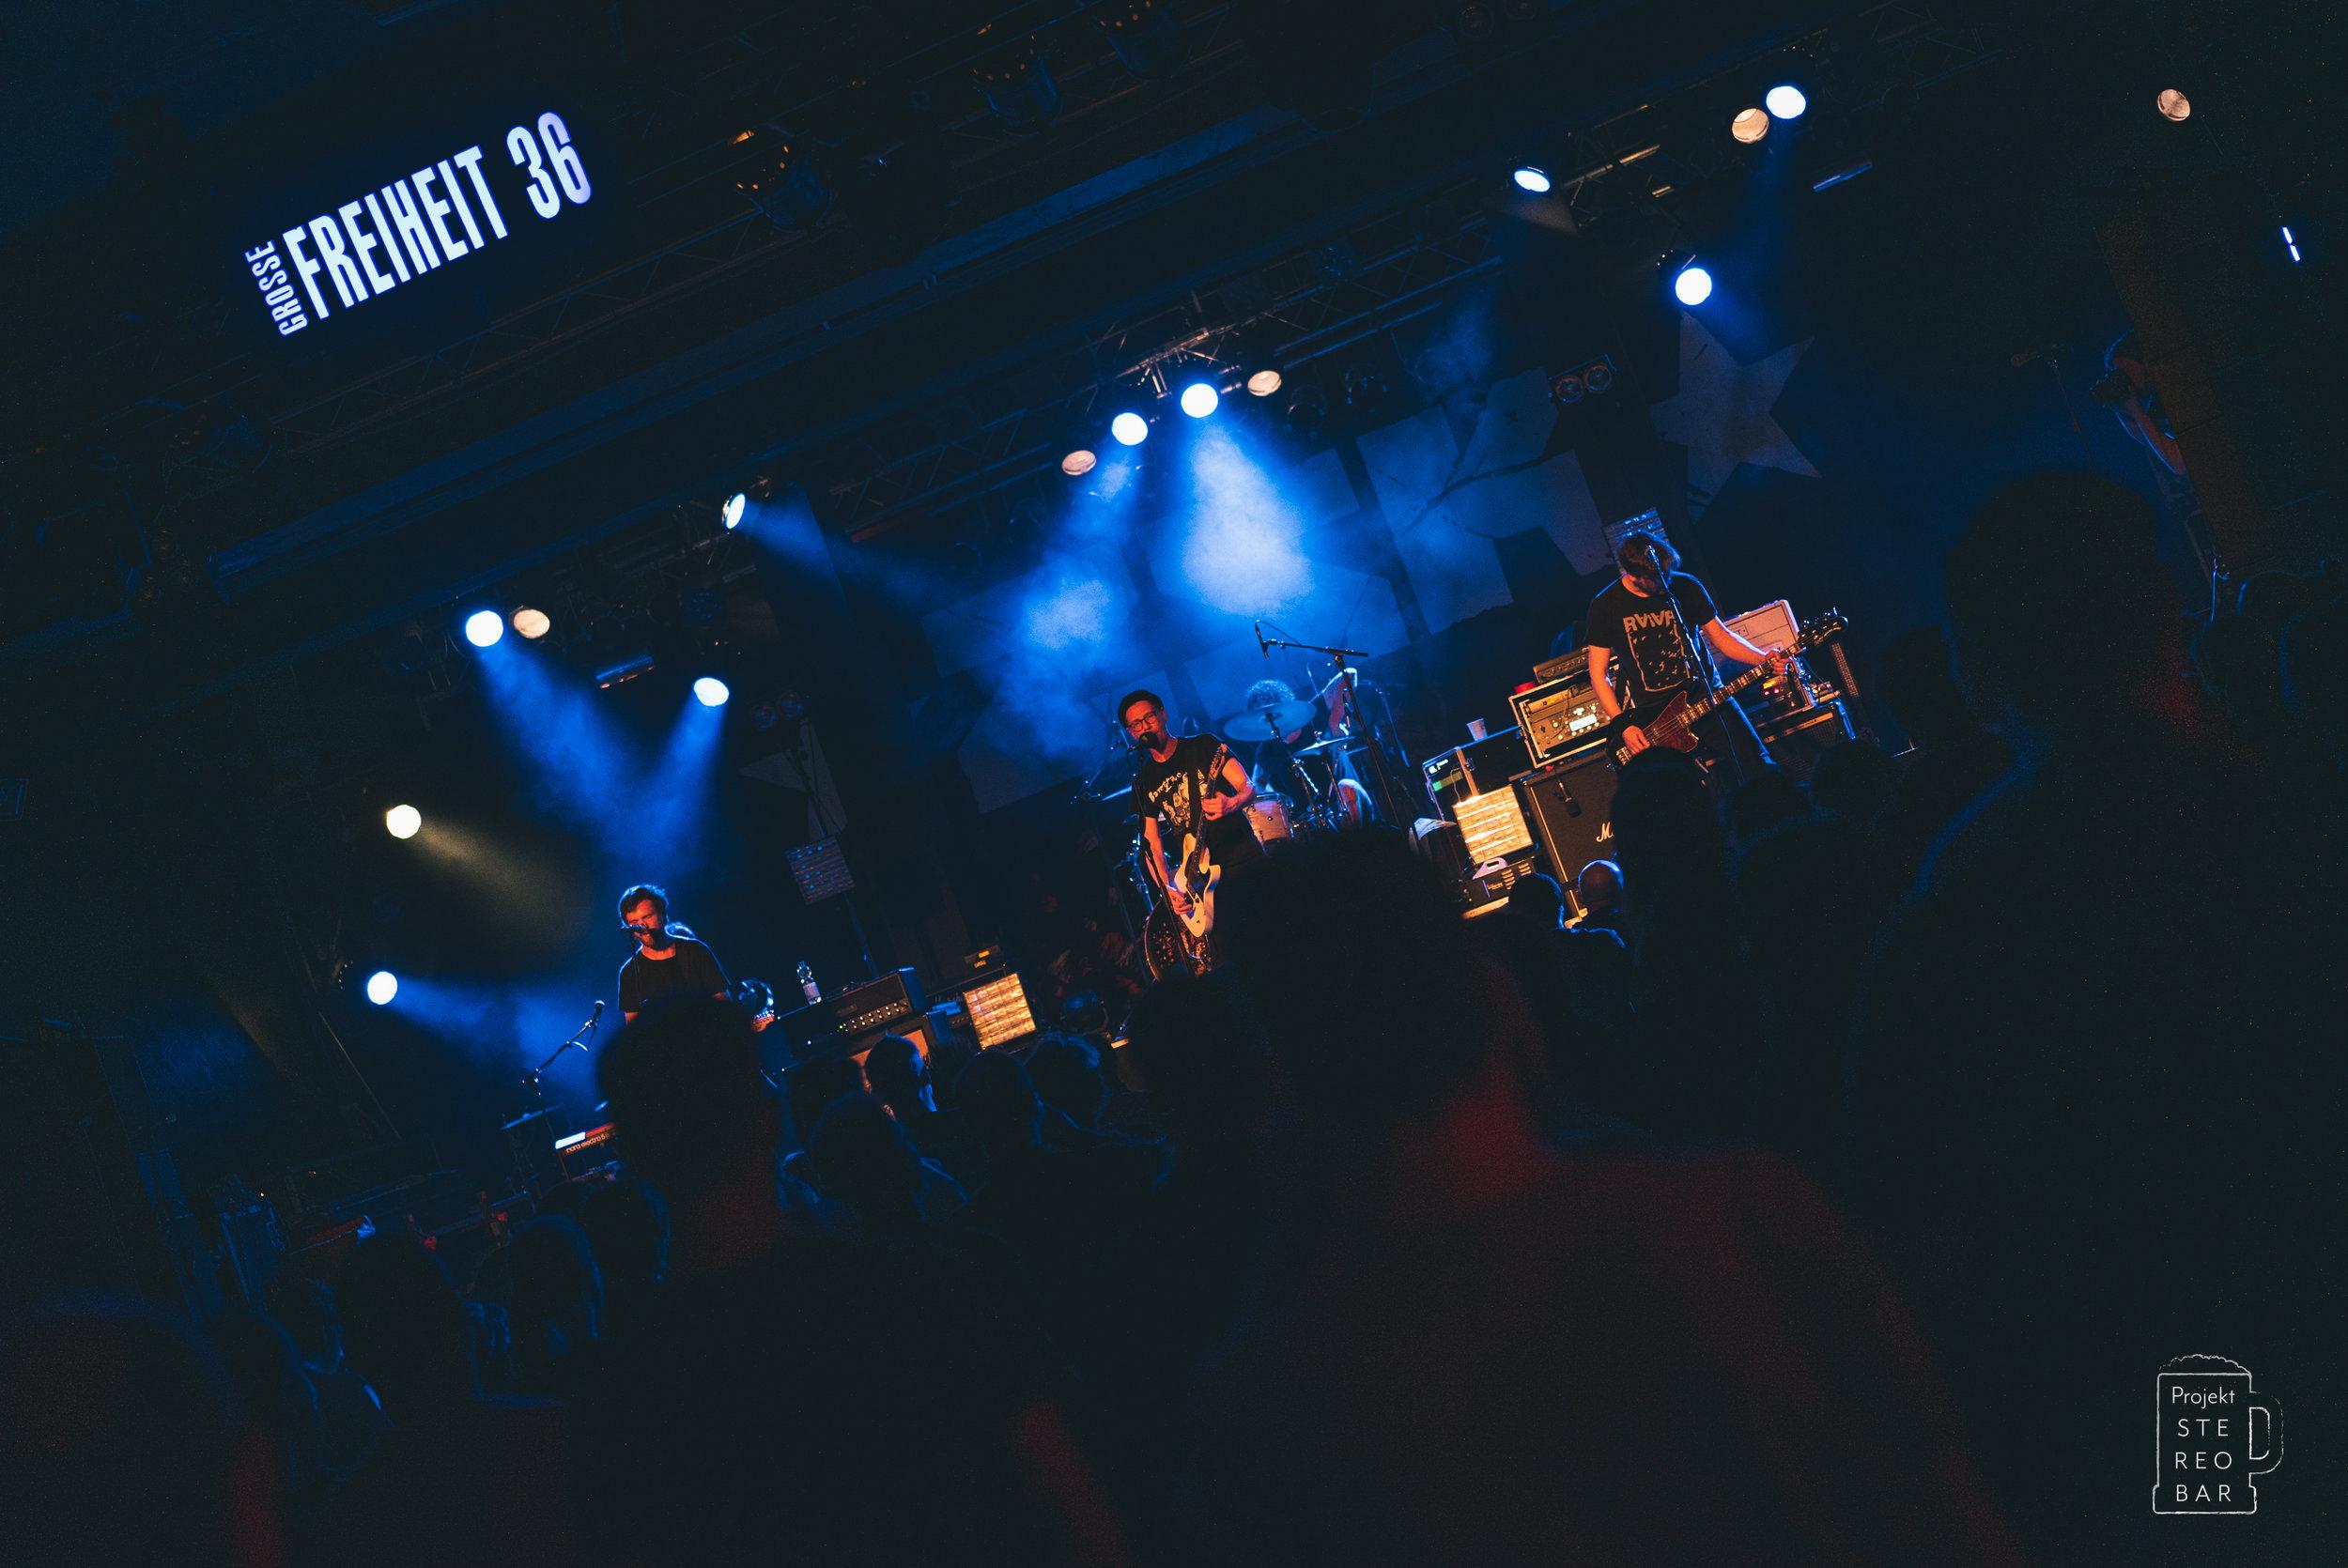 Foto: Jören Gloe / Projekt Stereo Bar